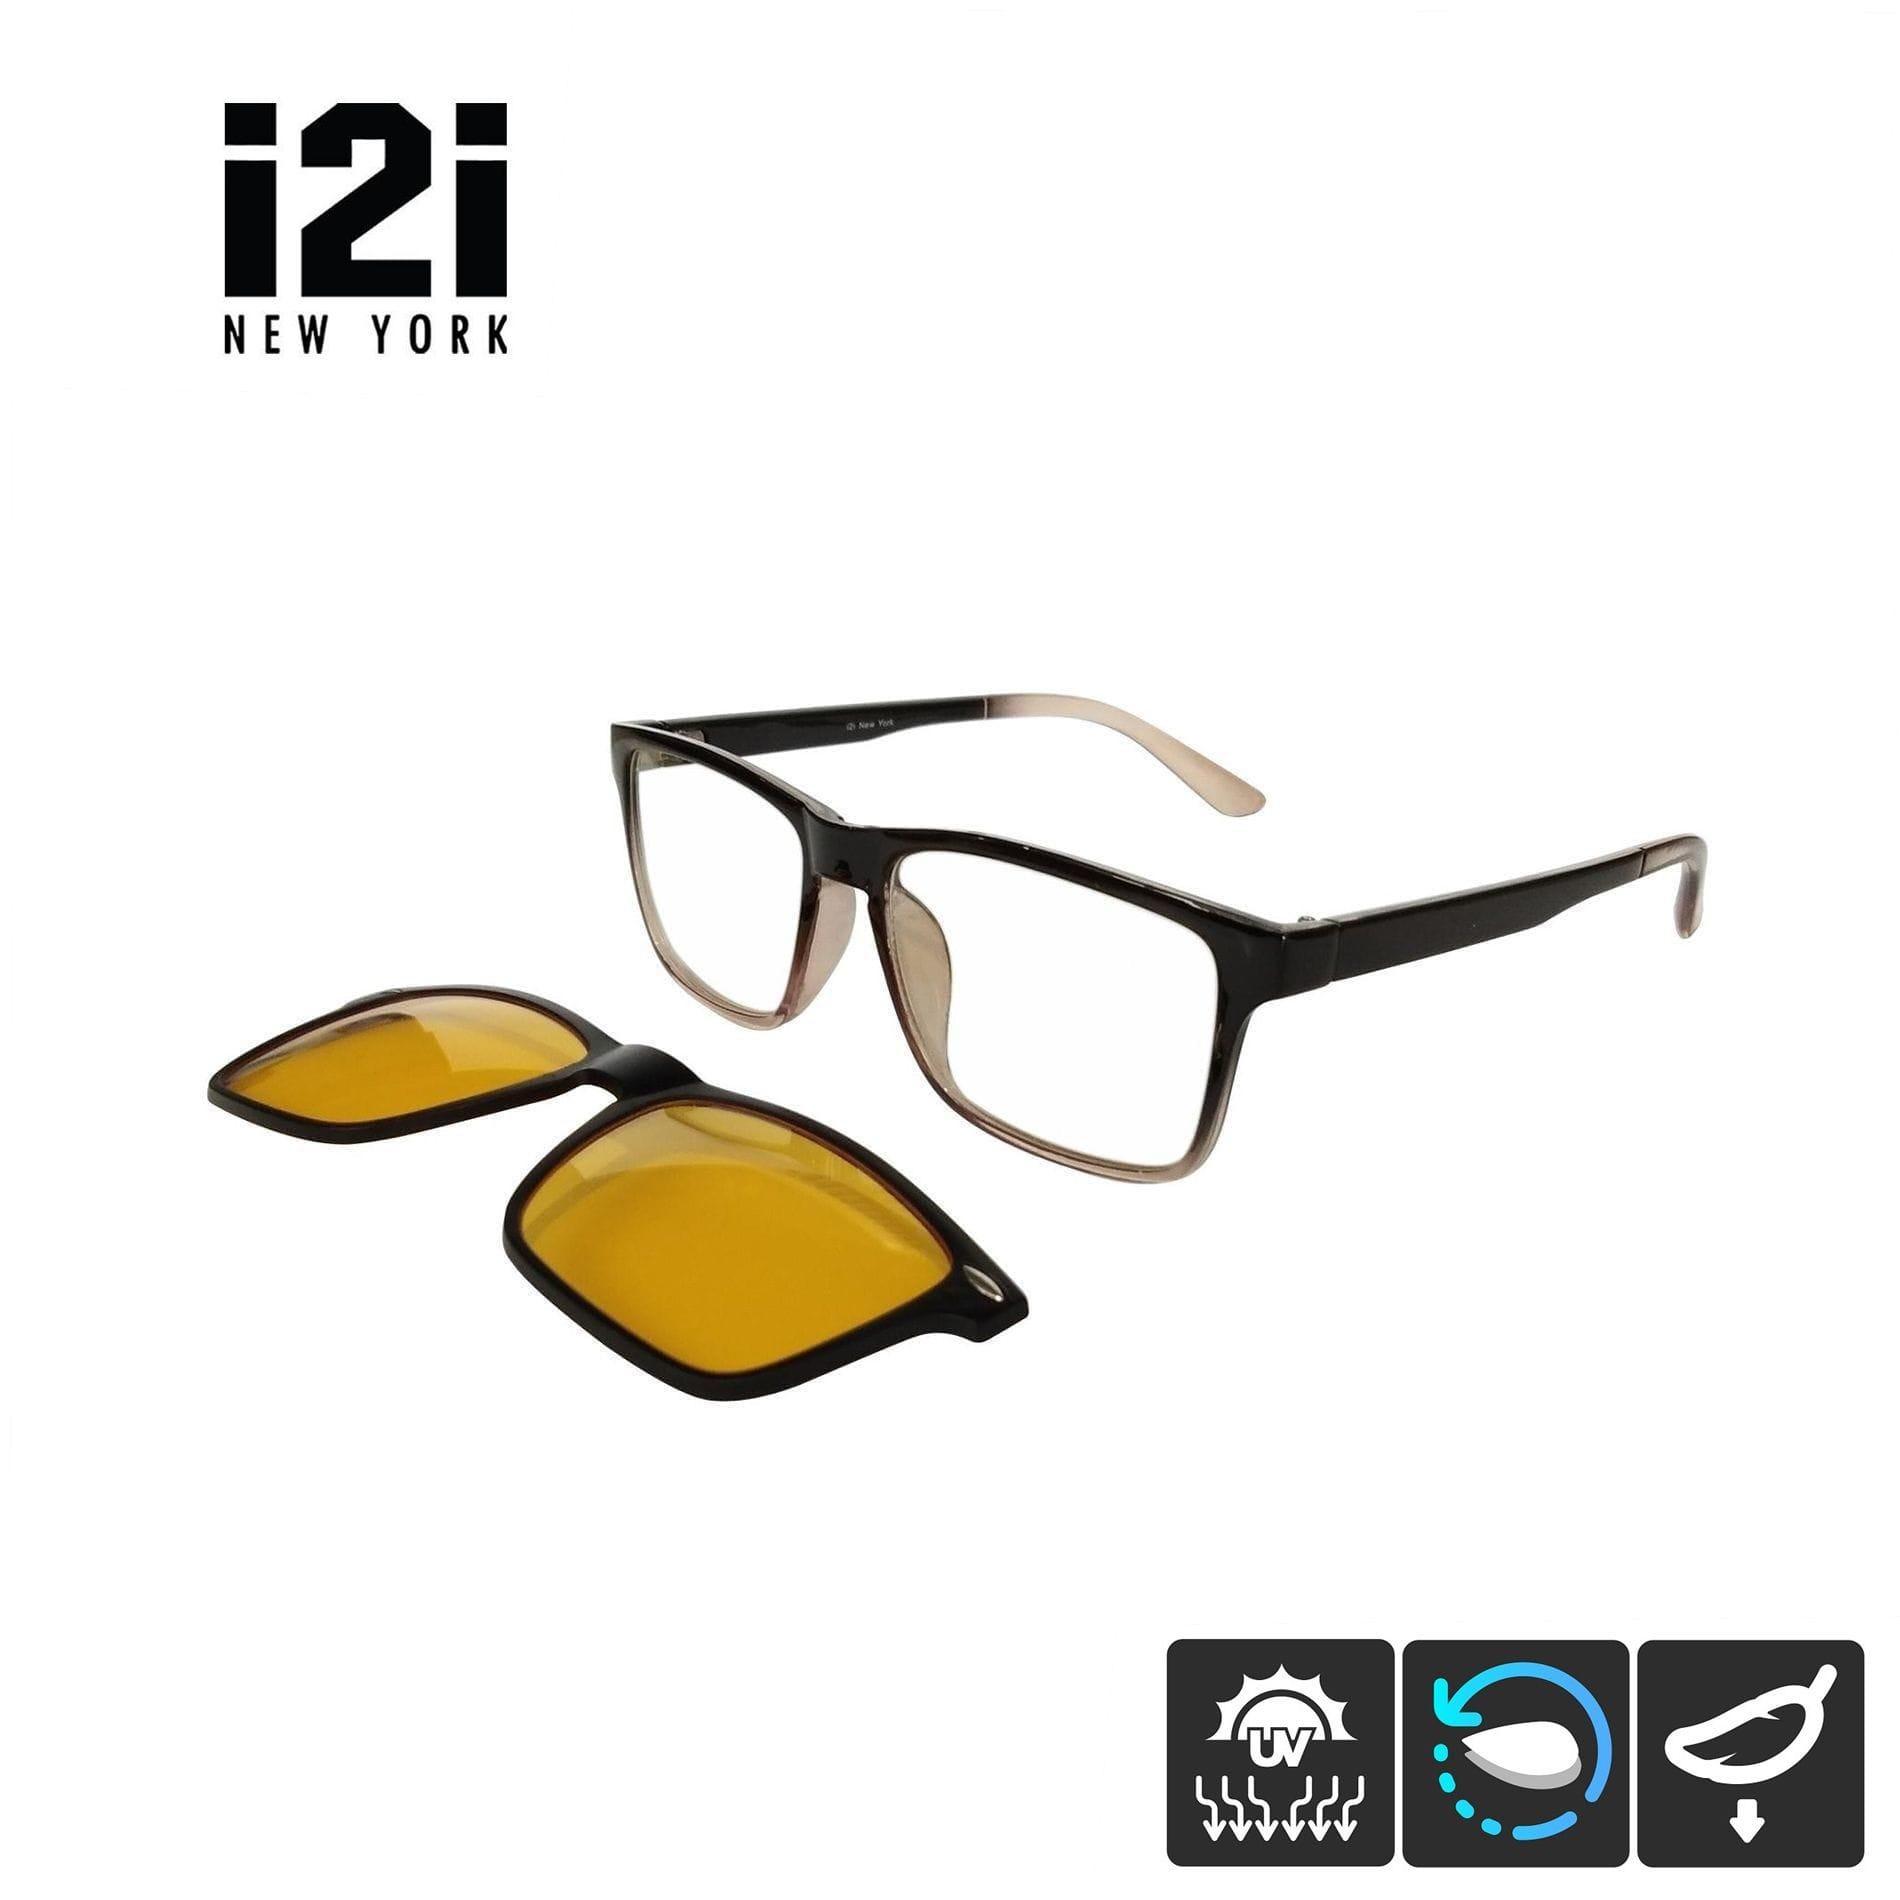 022ae0d315 i2i New York Burton 2 399 Magnetic Clip On Eyeglasses (Glossy   Gradient  Brown)